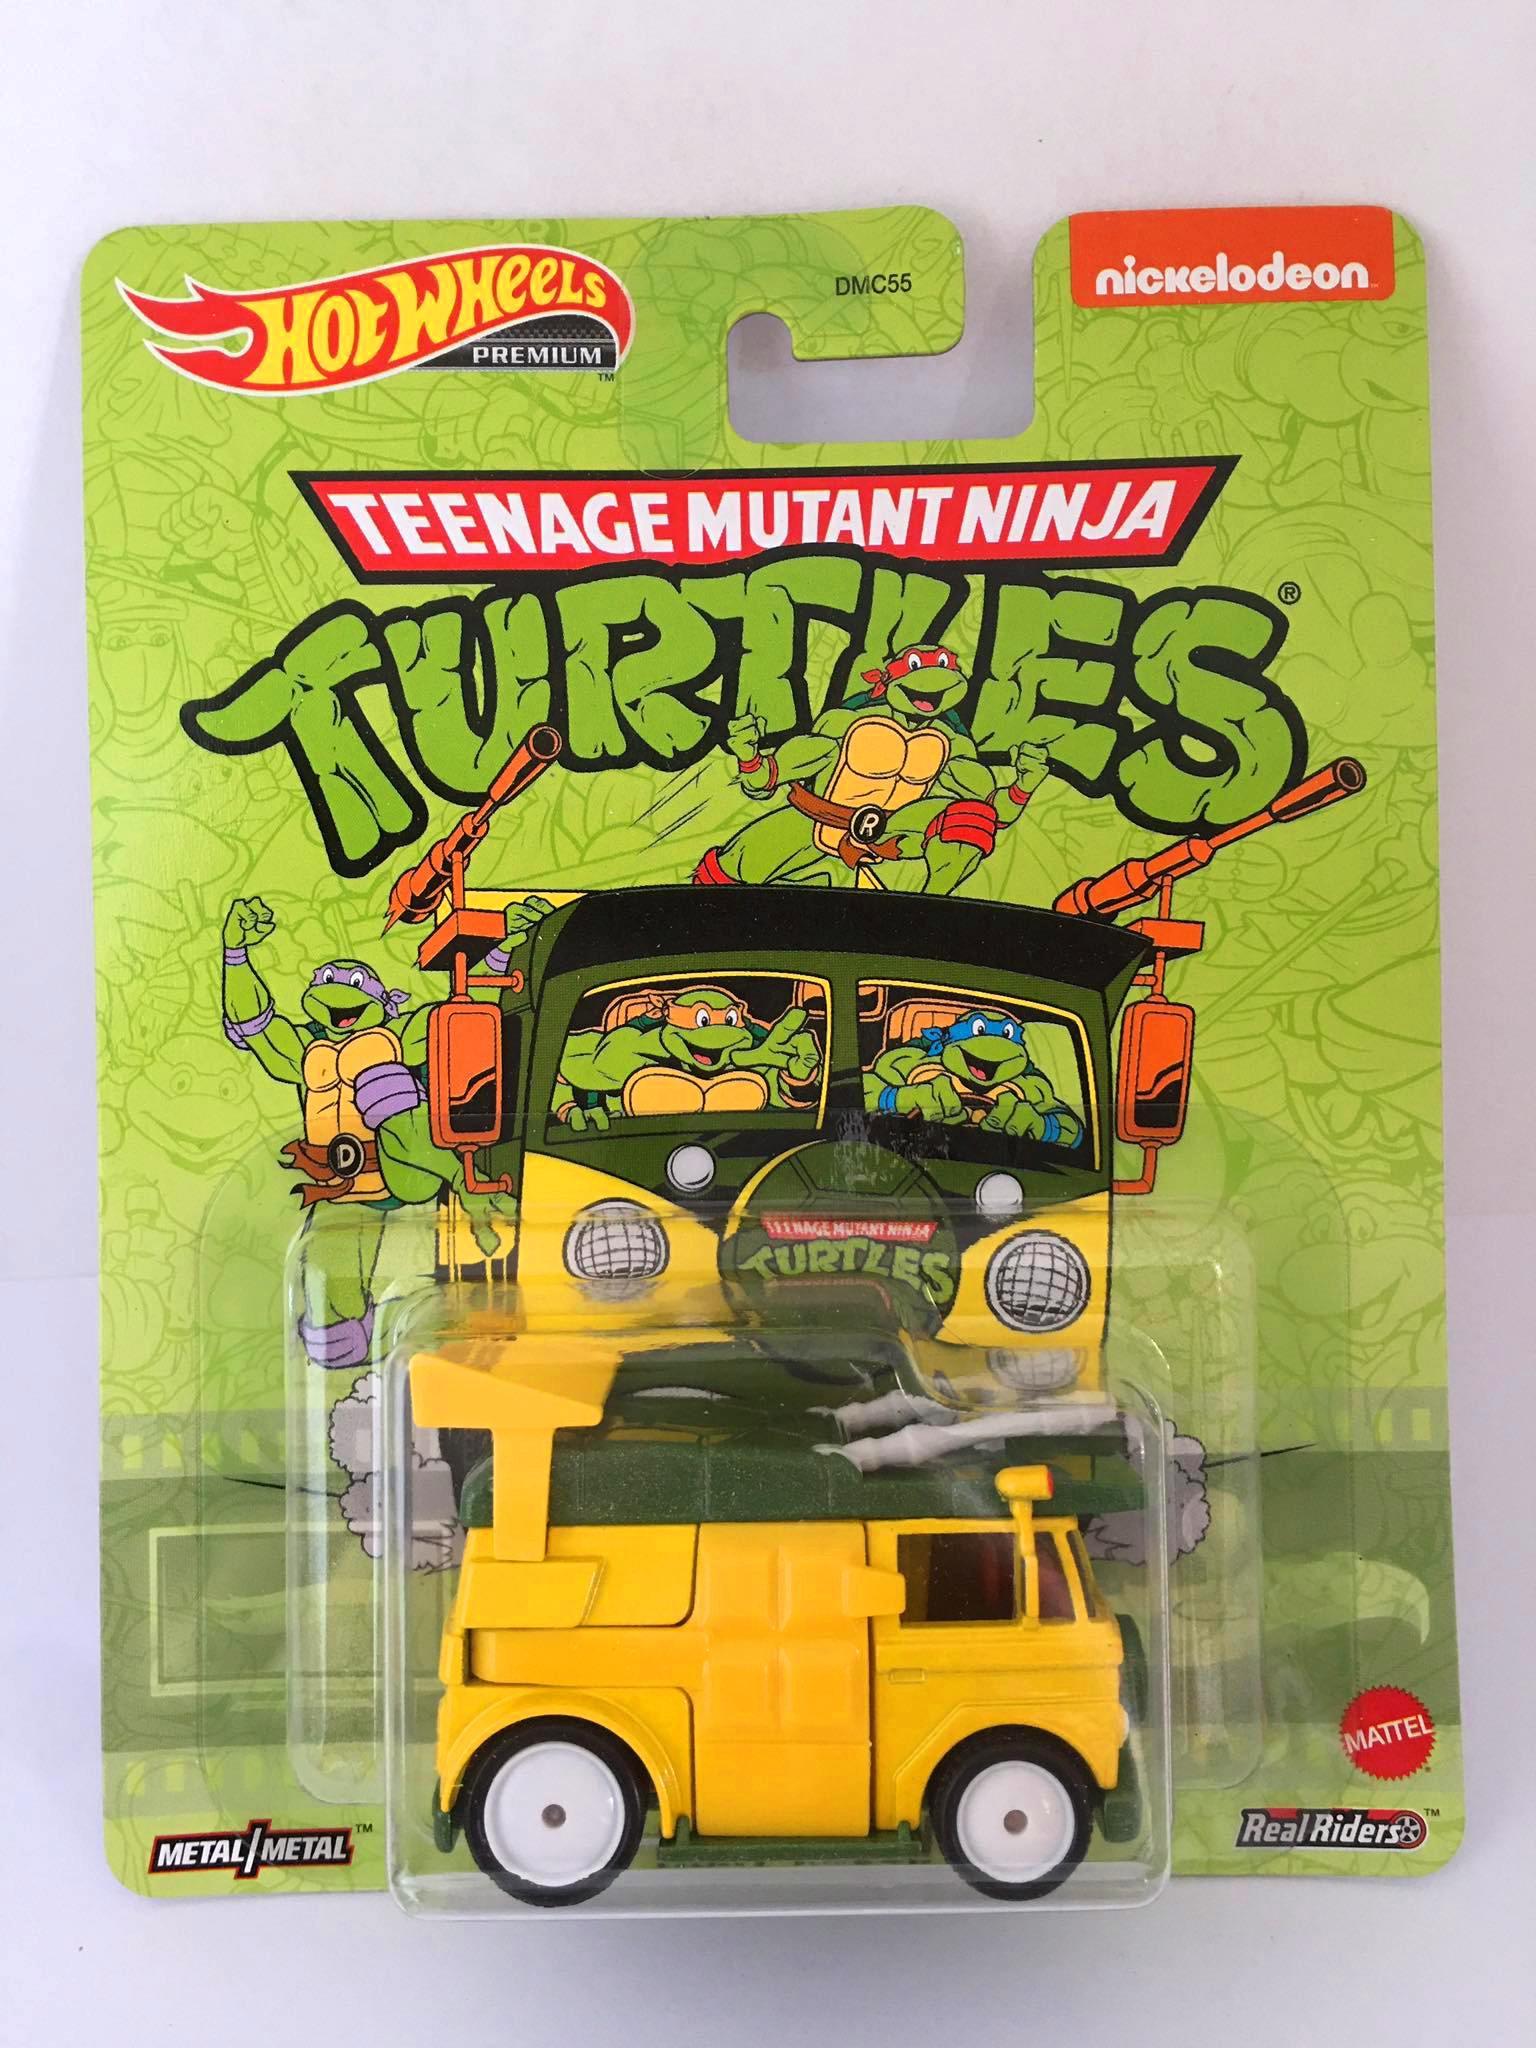 Hot Wheels - Party Wagon Amarelo - Mutant Ninja Turtles - Tartarugas Ninja - Retro Mix T